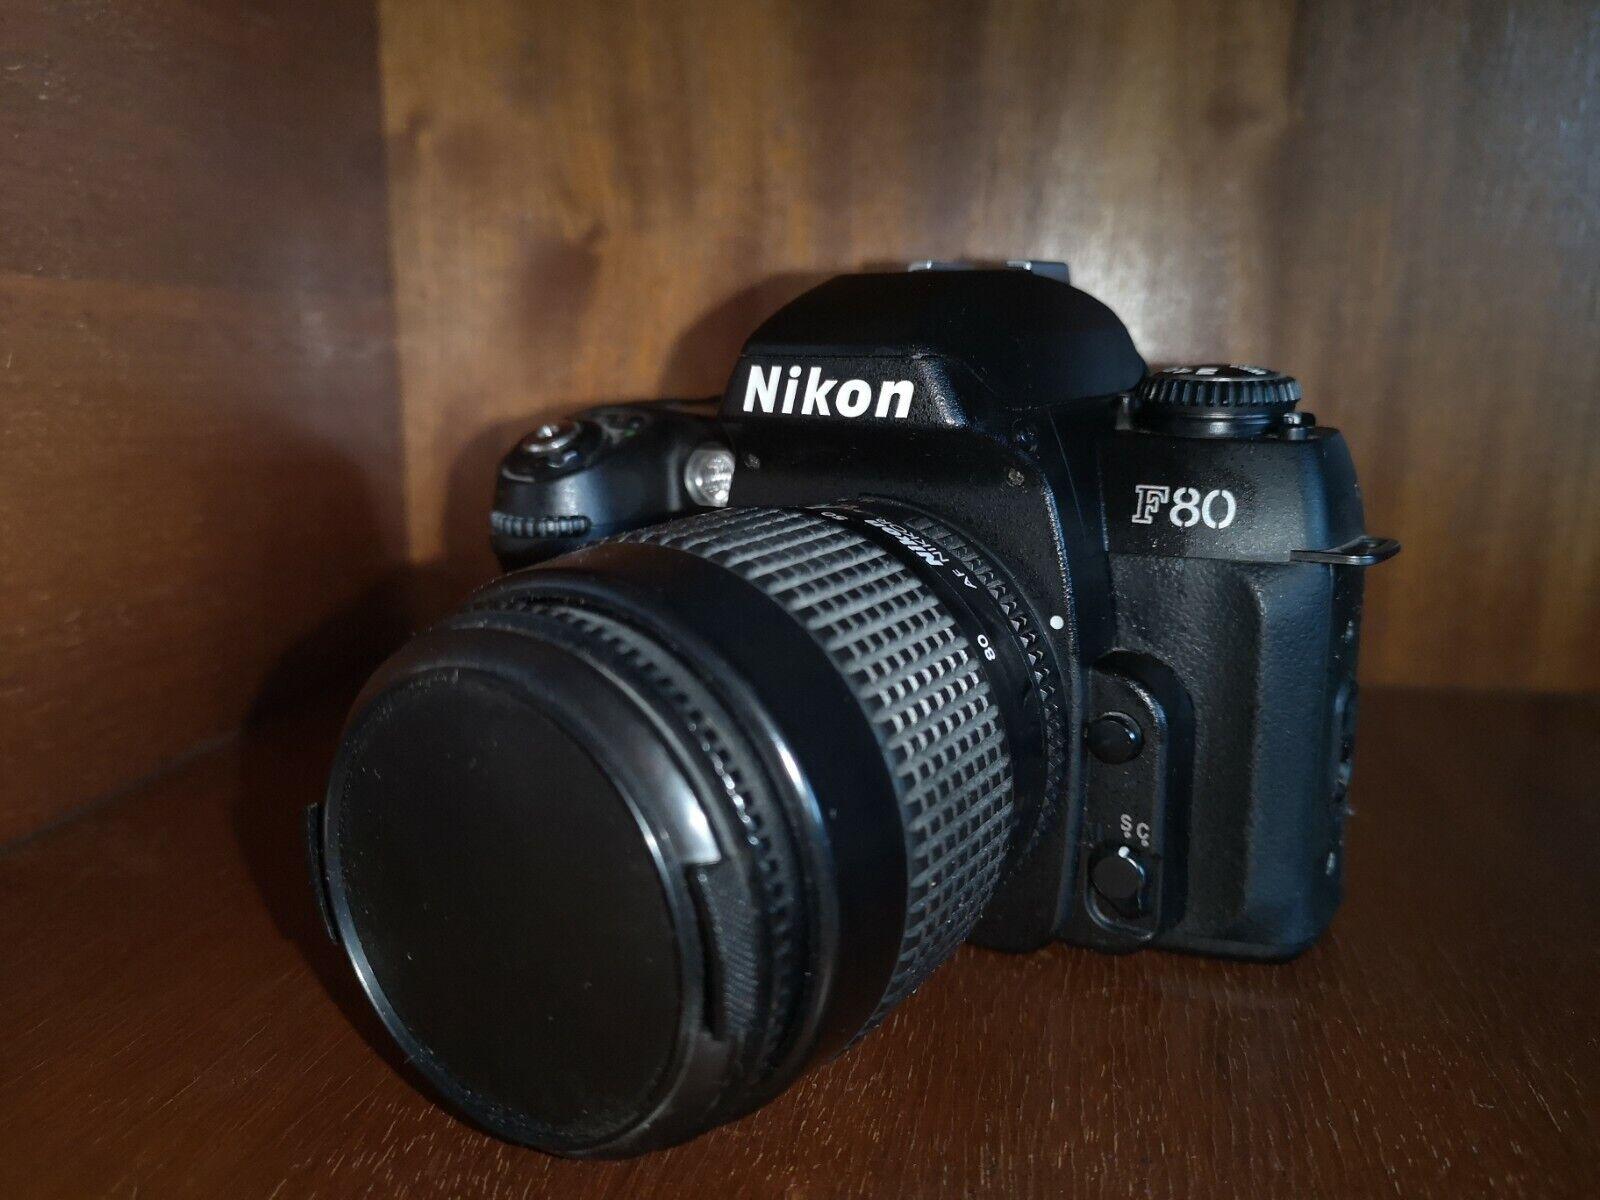 Nikon F80 F 80 Spiegelreflexkamera analog gebraucht mit Objektiv